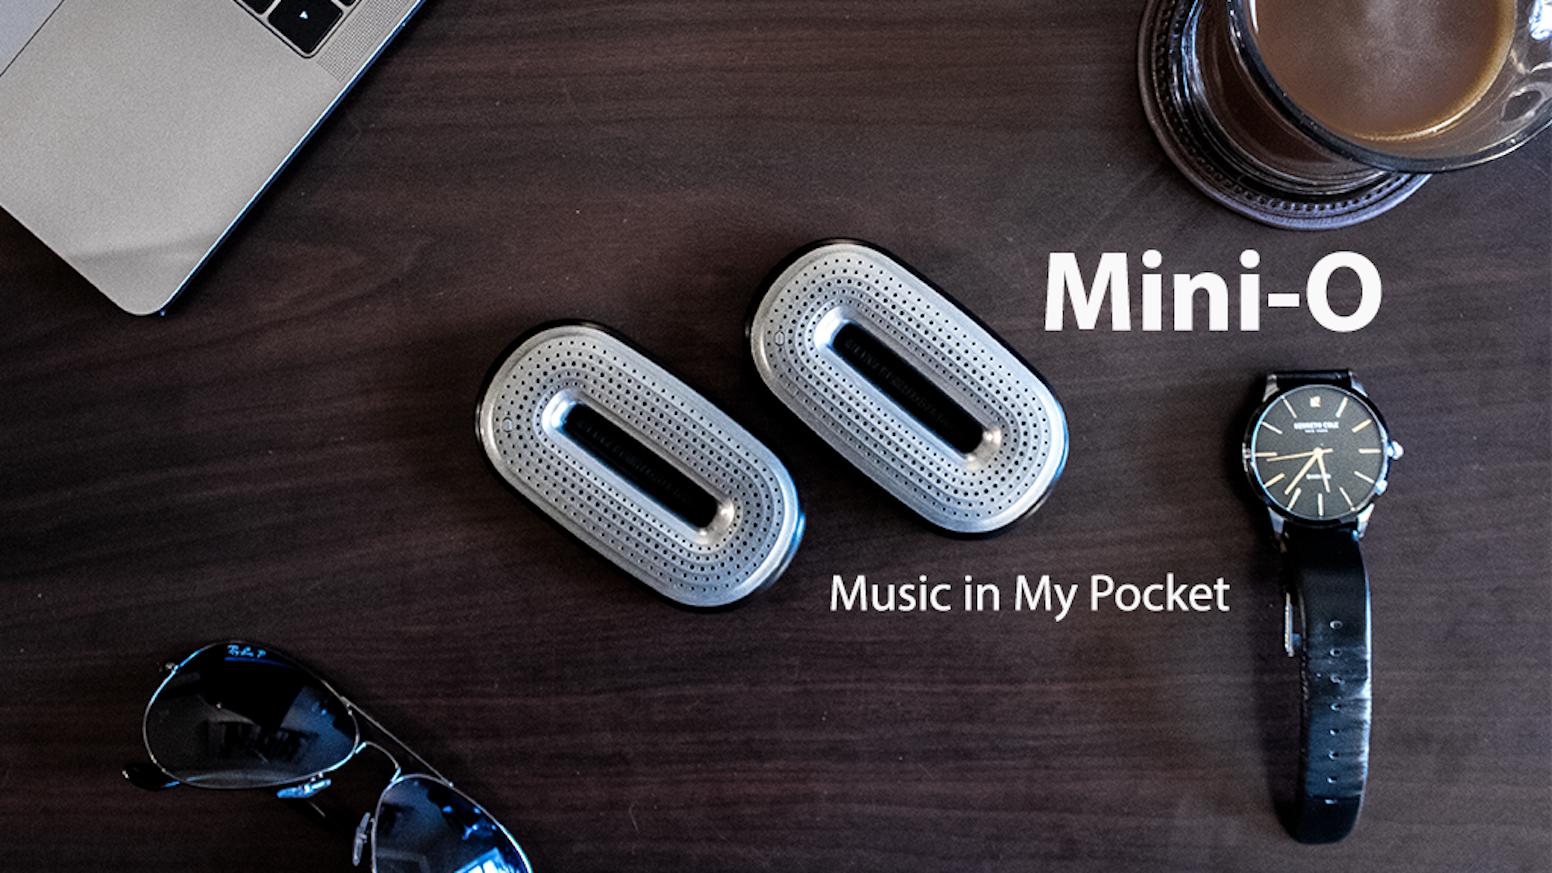 Mini O The Powerful Pocket Sized Speaker By Flato Kickstarter